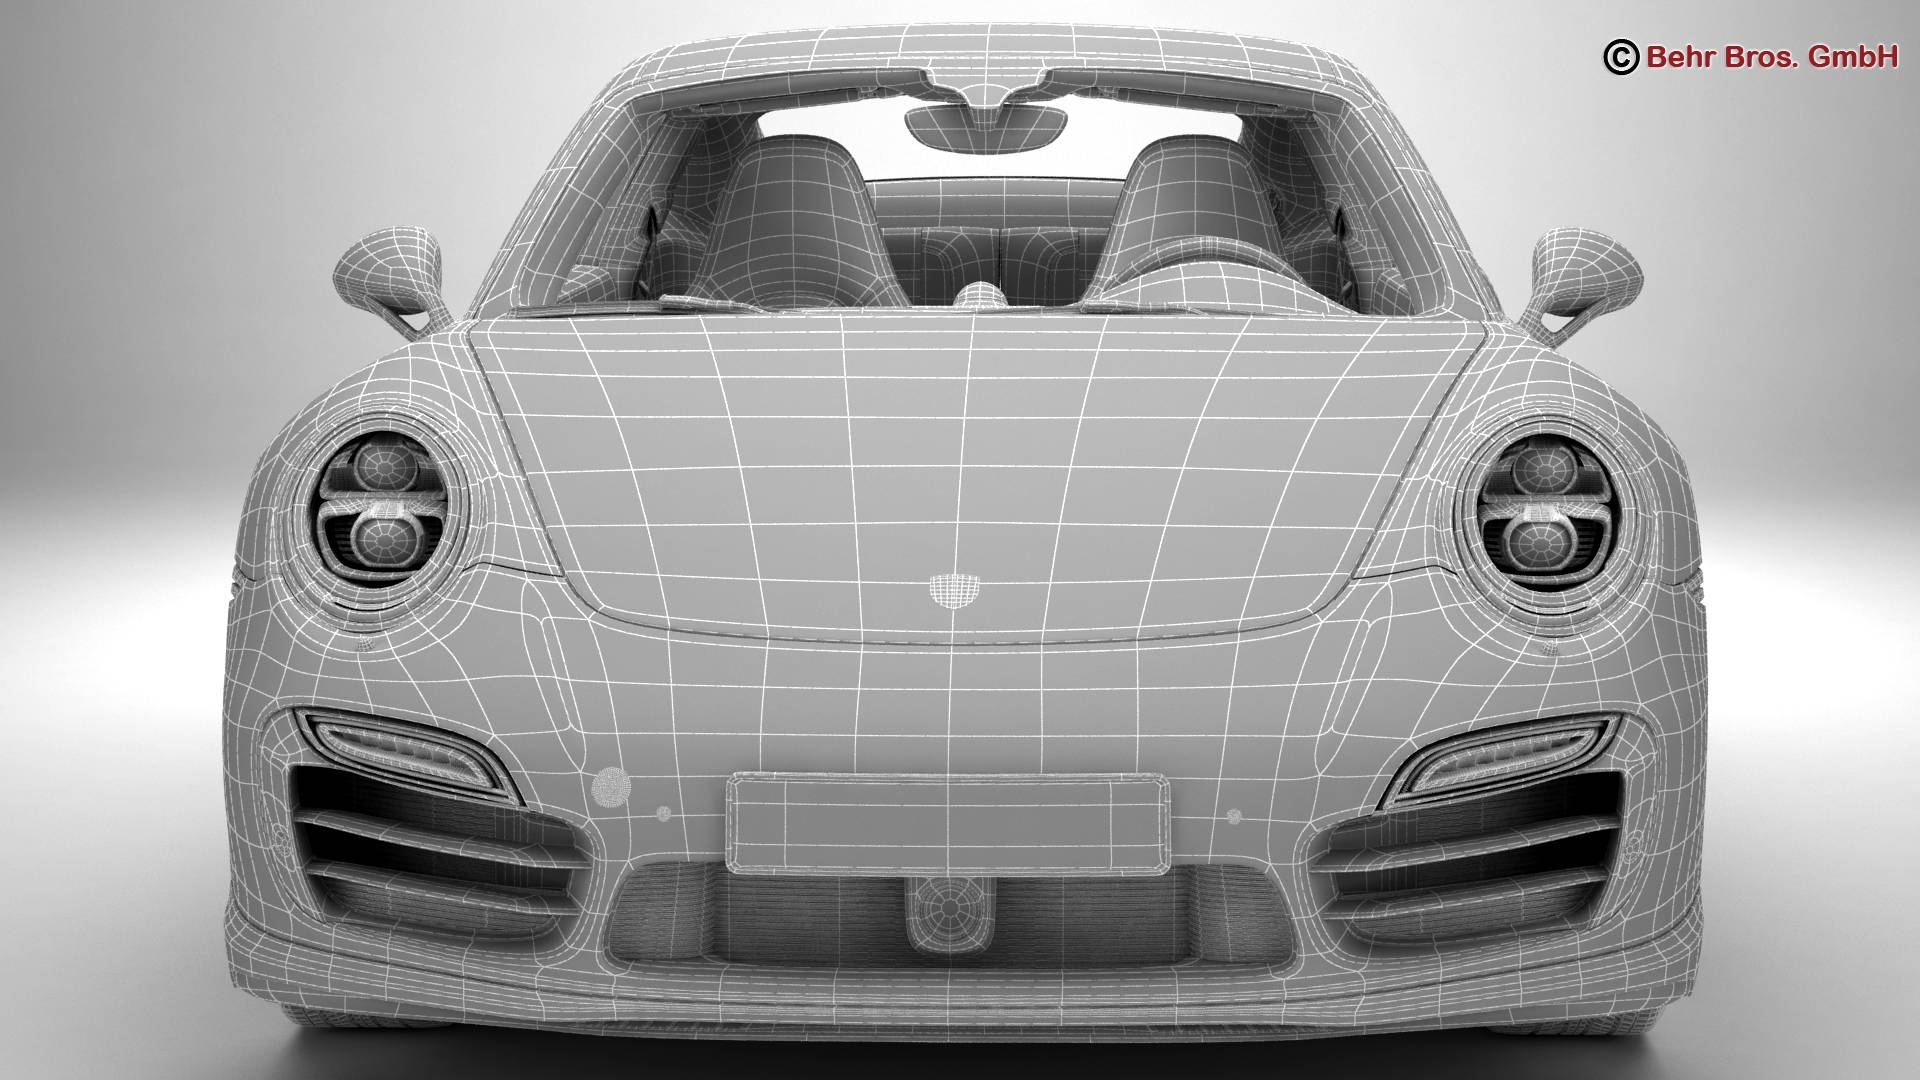 porsche 911 turbo s 2014 3d model 3ds max fbx c4d lwo ma mb obj 212496